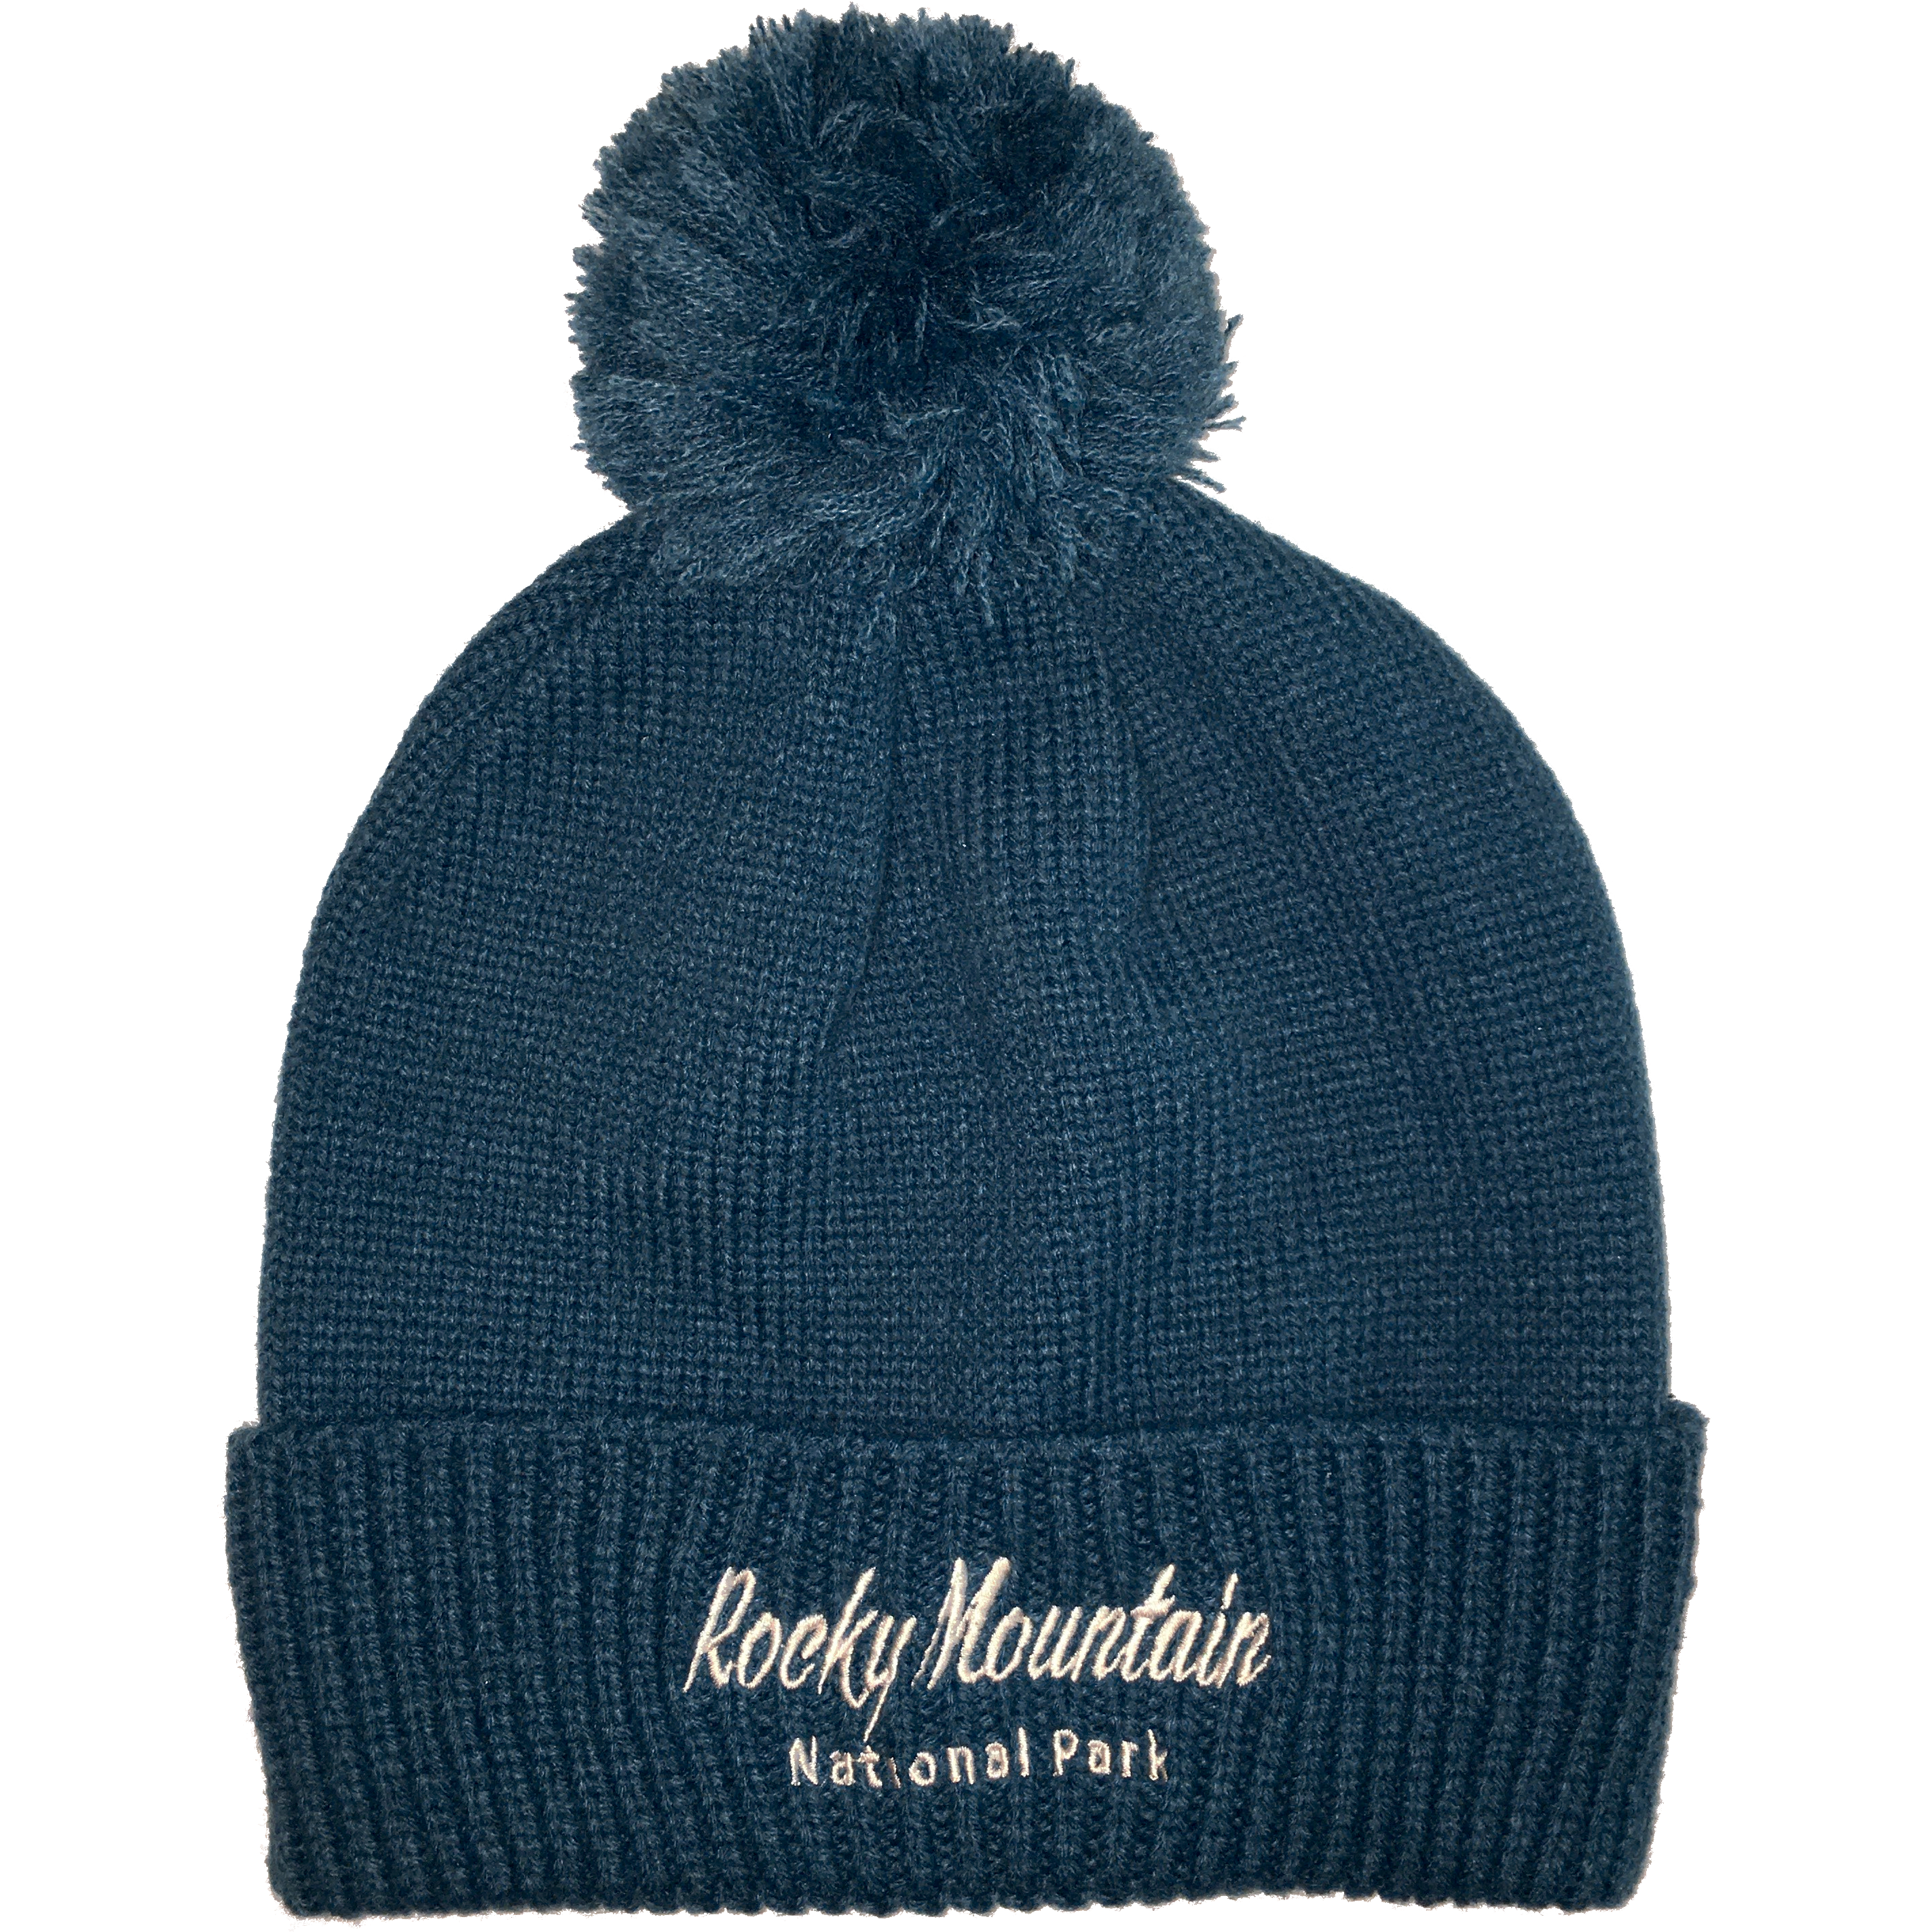 RMNP blue hat